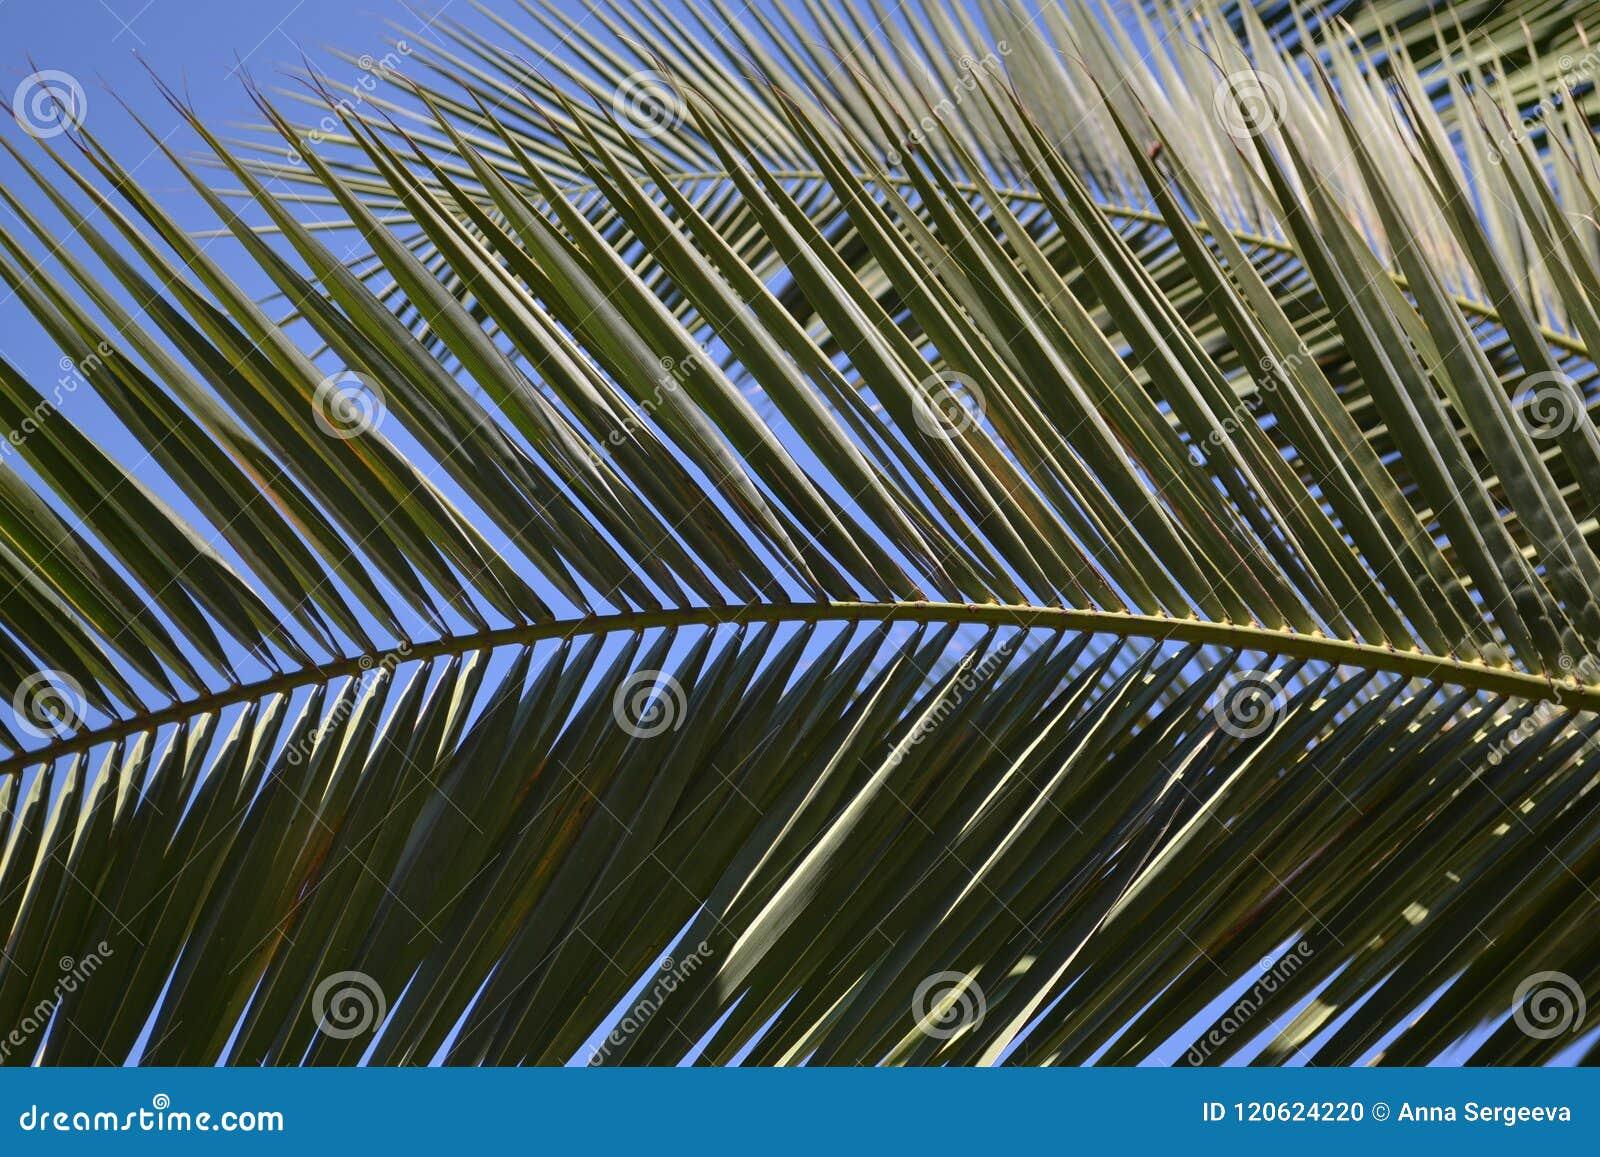 The beautiful palm leaf